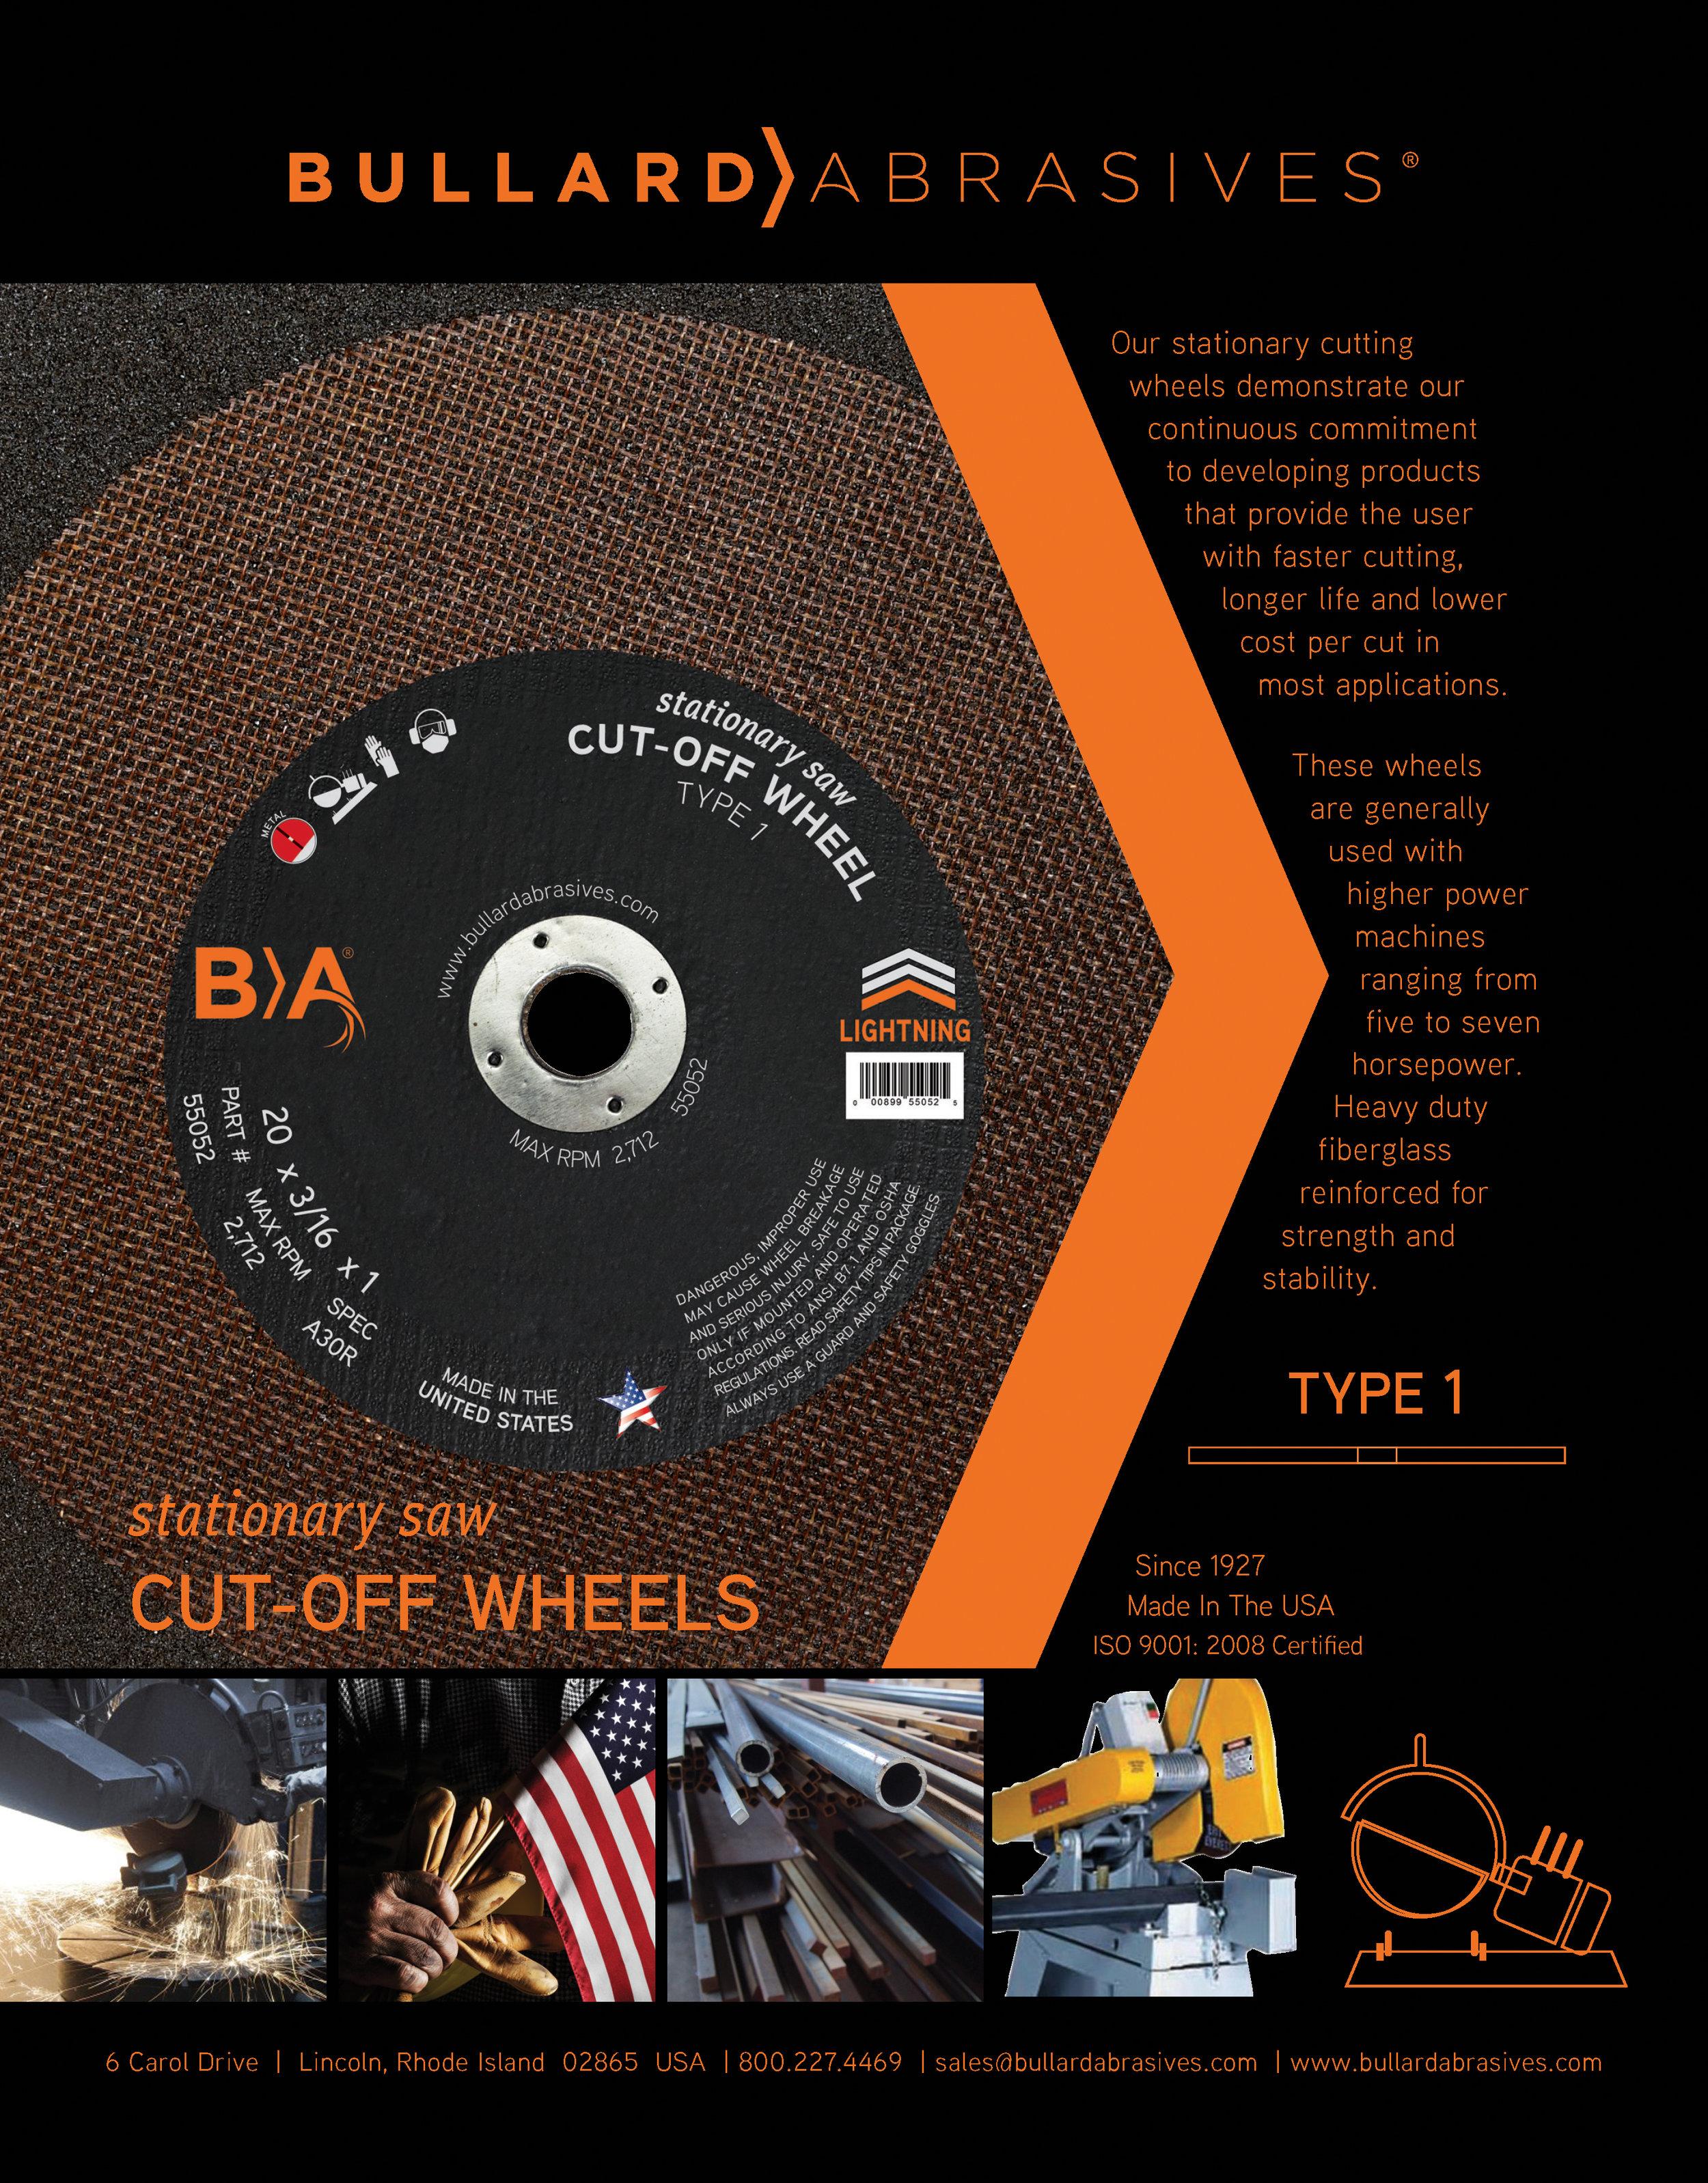 Stationary Saw Cut-Off Wheels Type 1